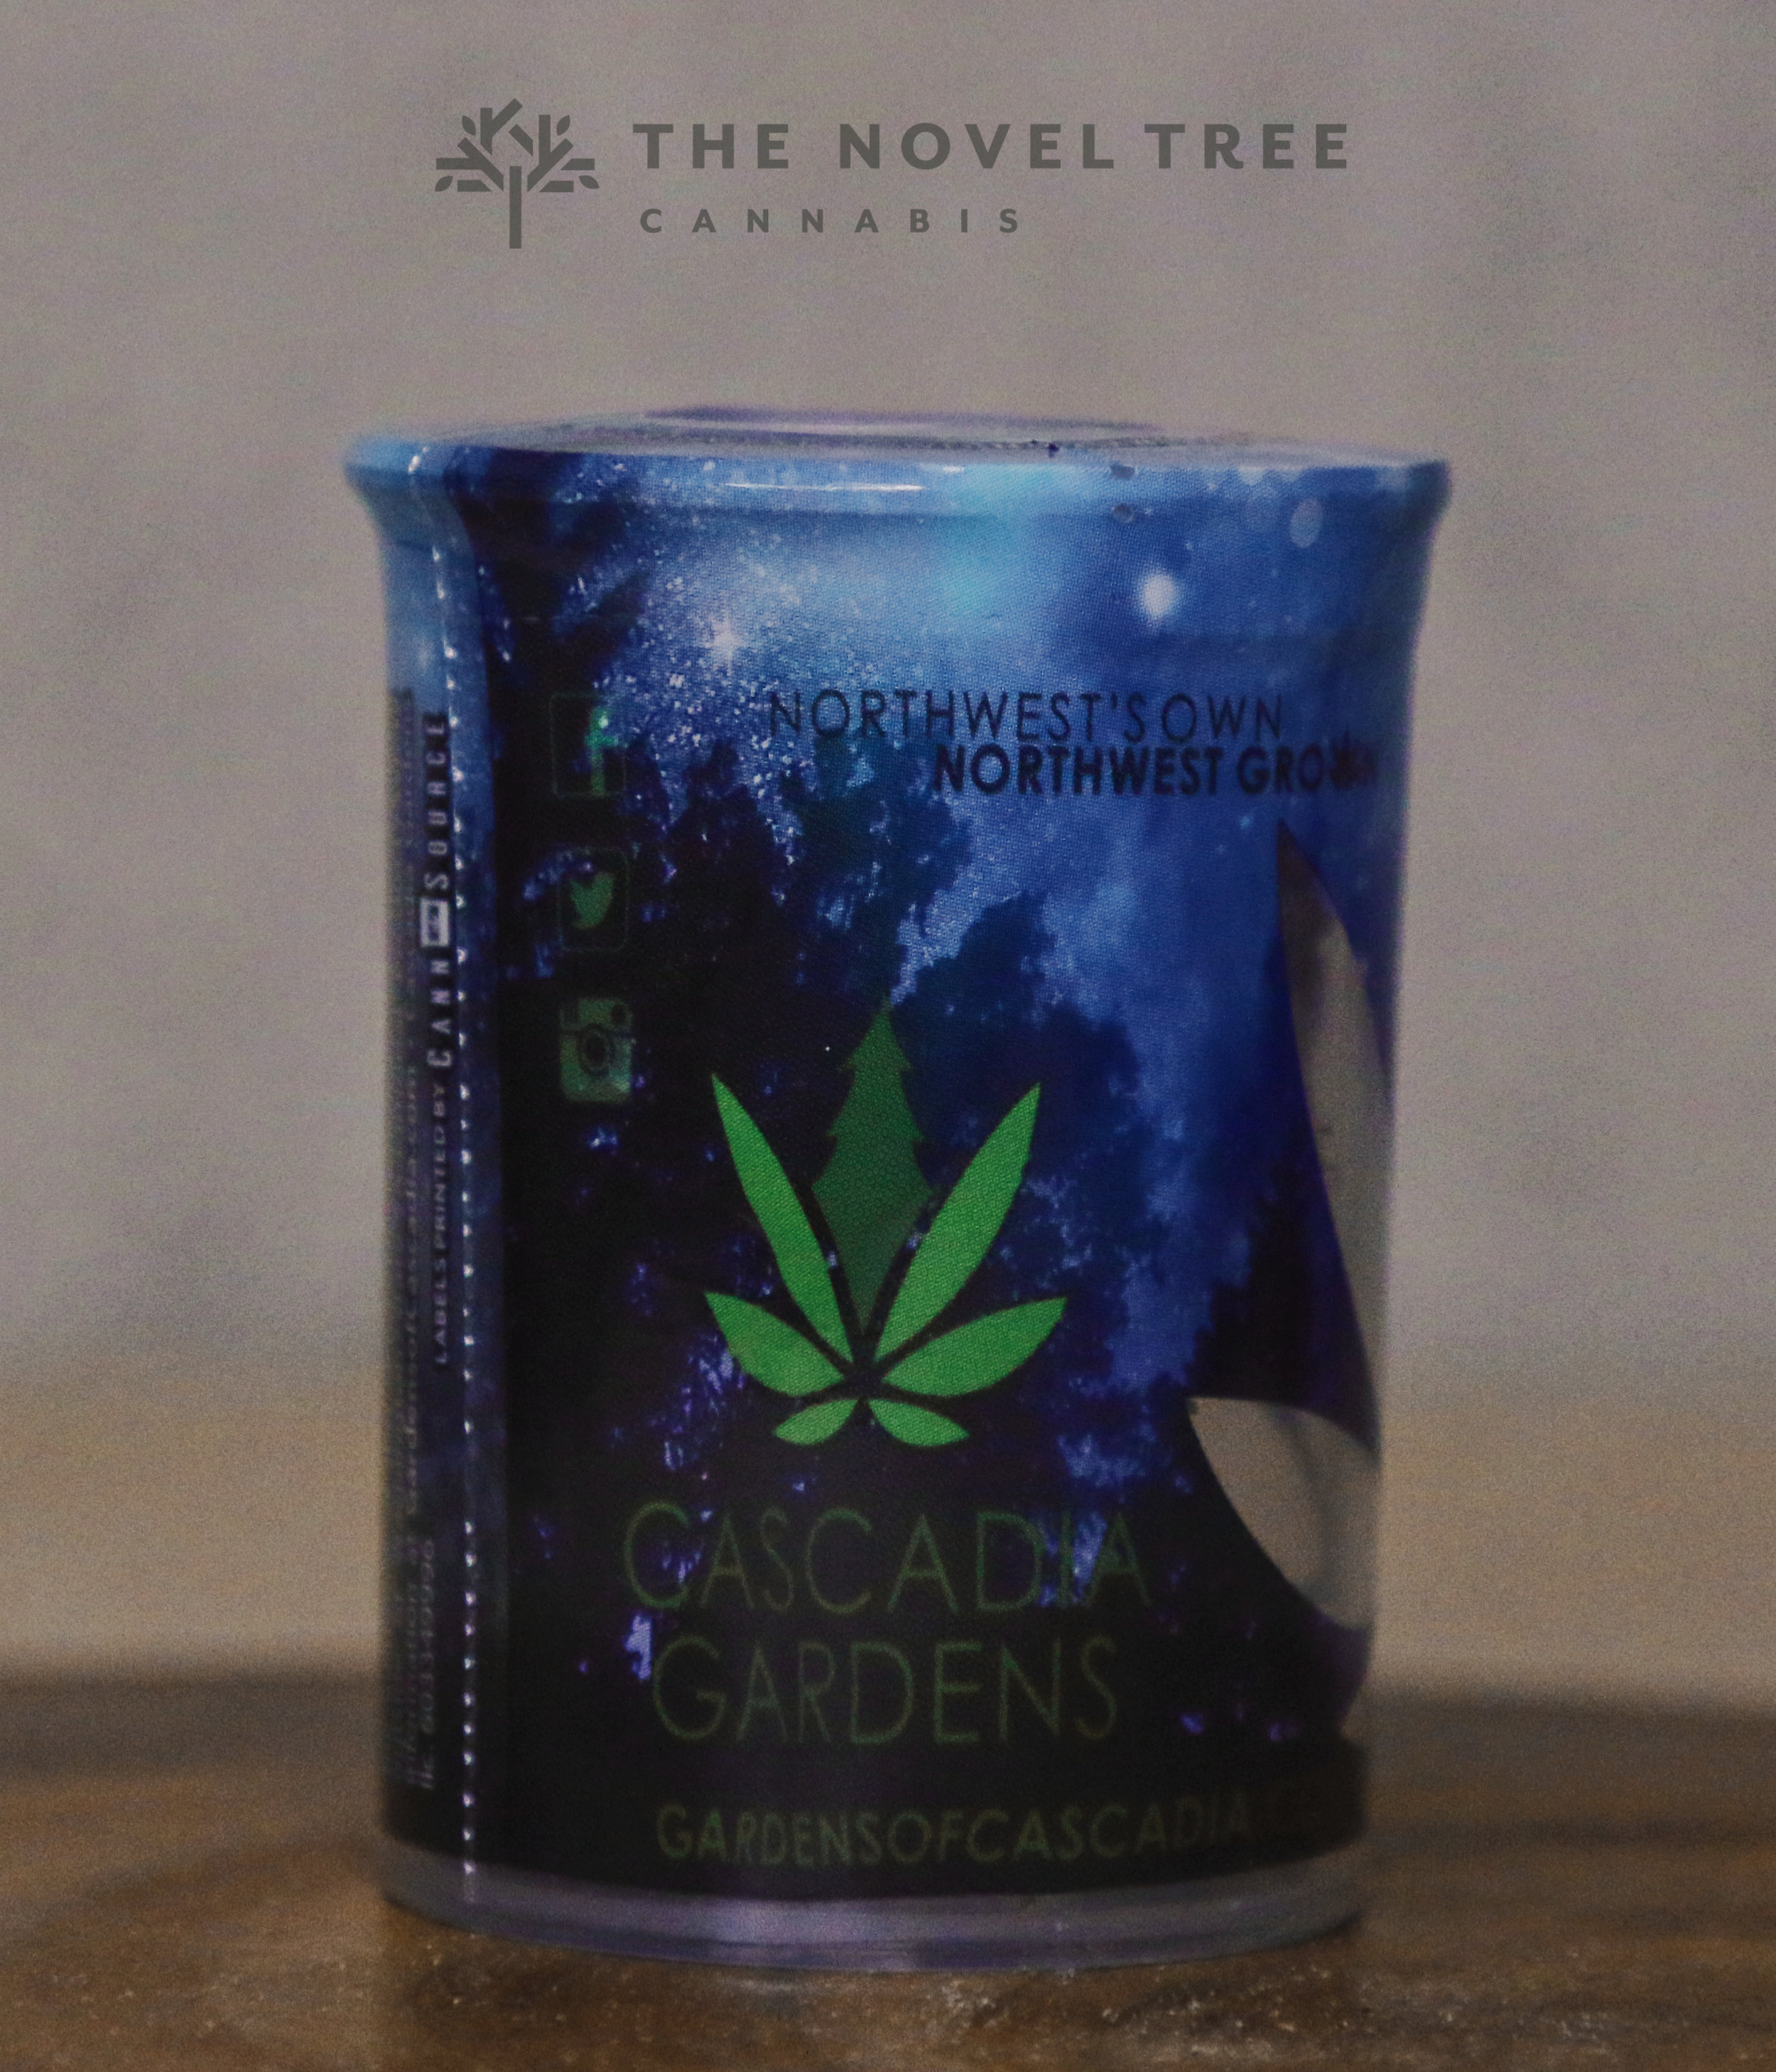 Cascadia Gardens - The Jack10.jpg